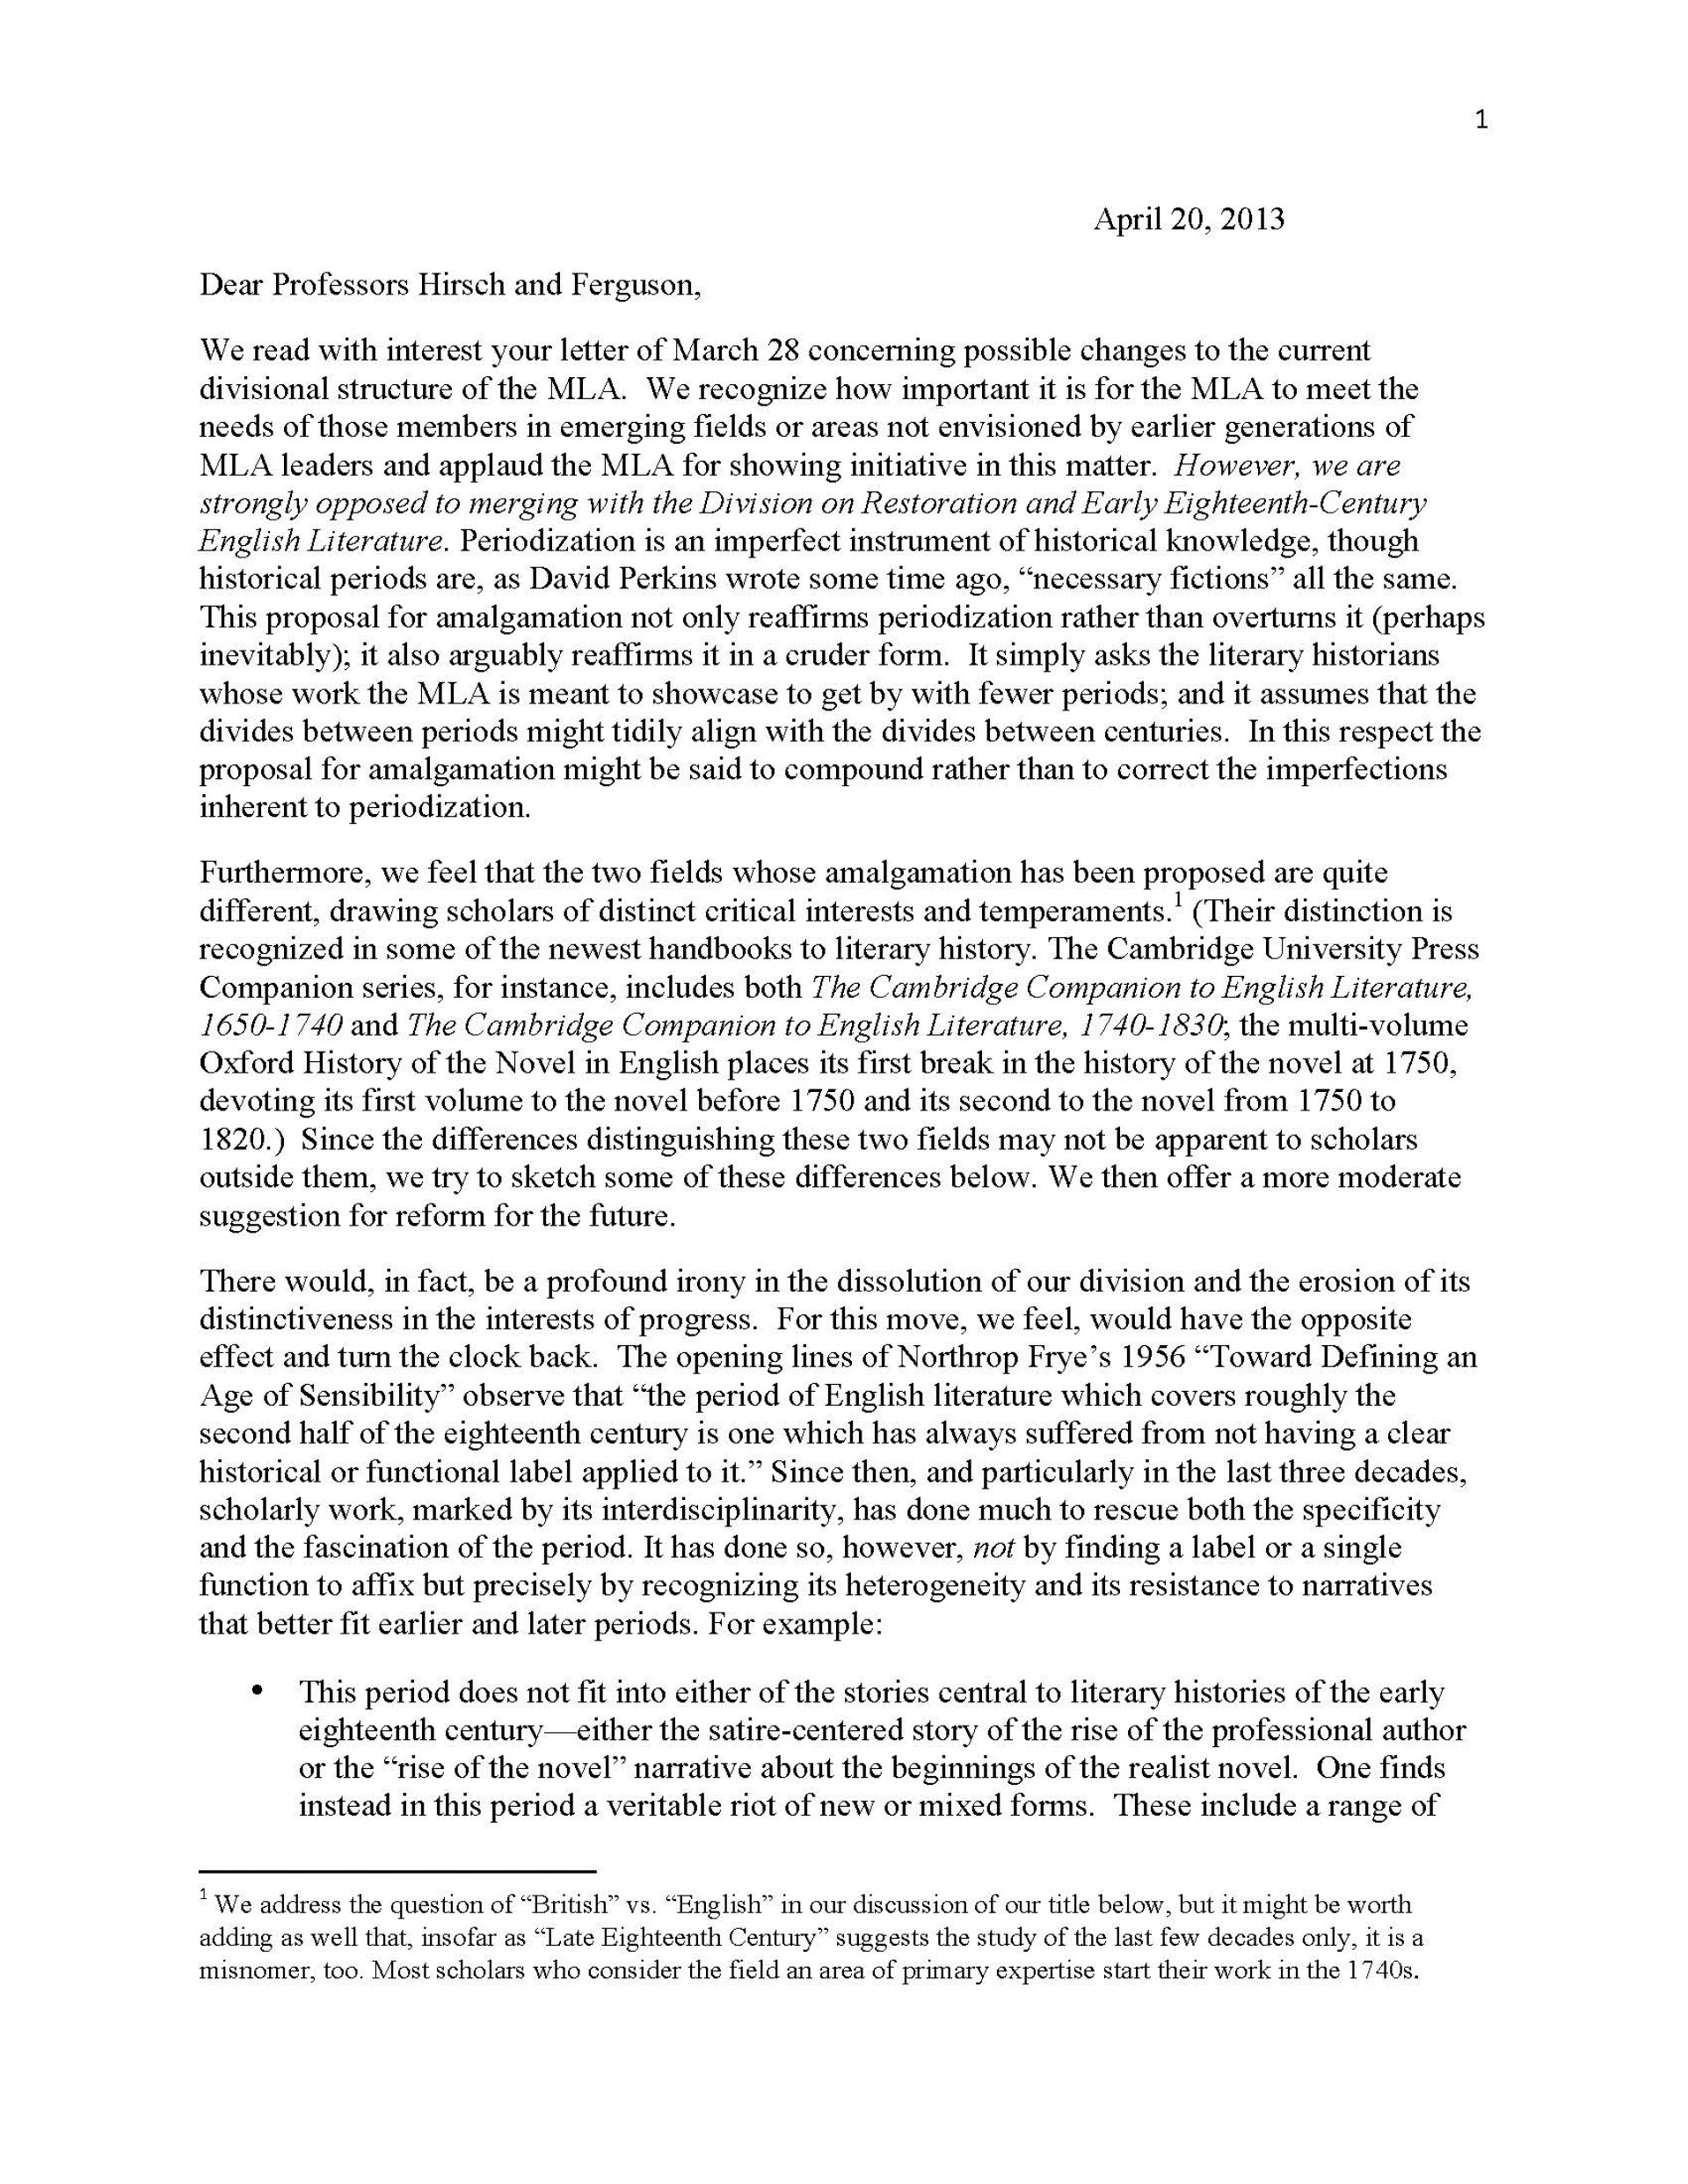 016 Response To Marianne Hirsch Margaret Ferguson Rev Final Copy Page 1 Free Professional Essays Essay Impressive 1920